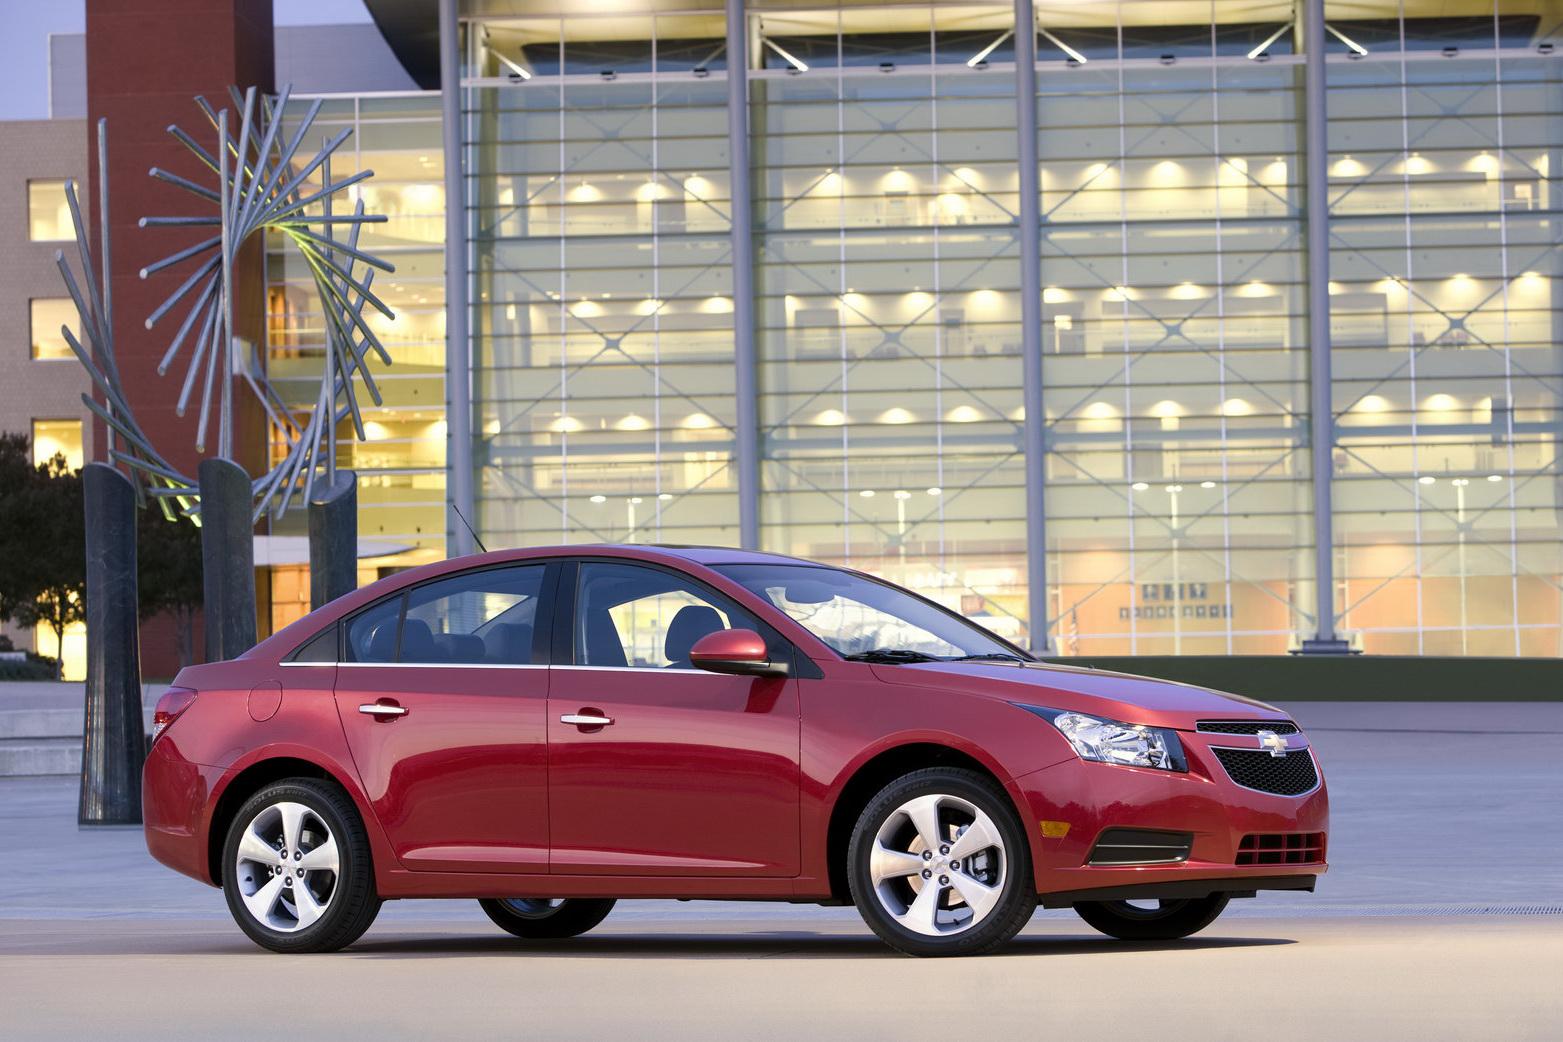 Gm Recall Chevrolet Cruze Models For 2011 Auto Blitz